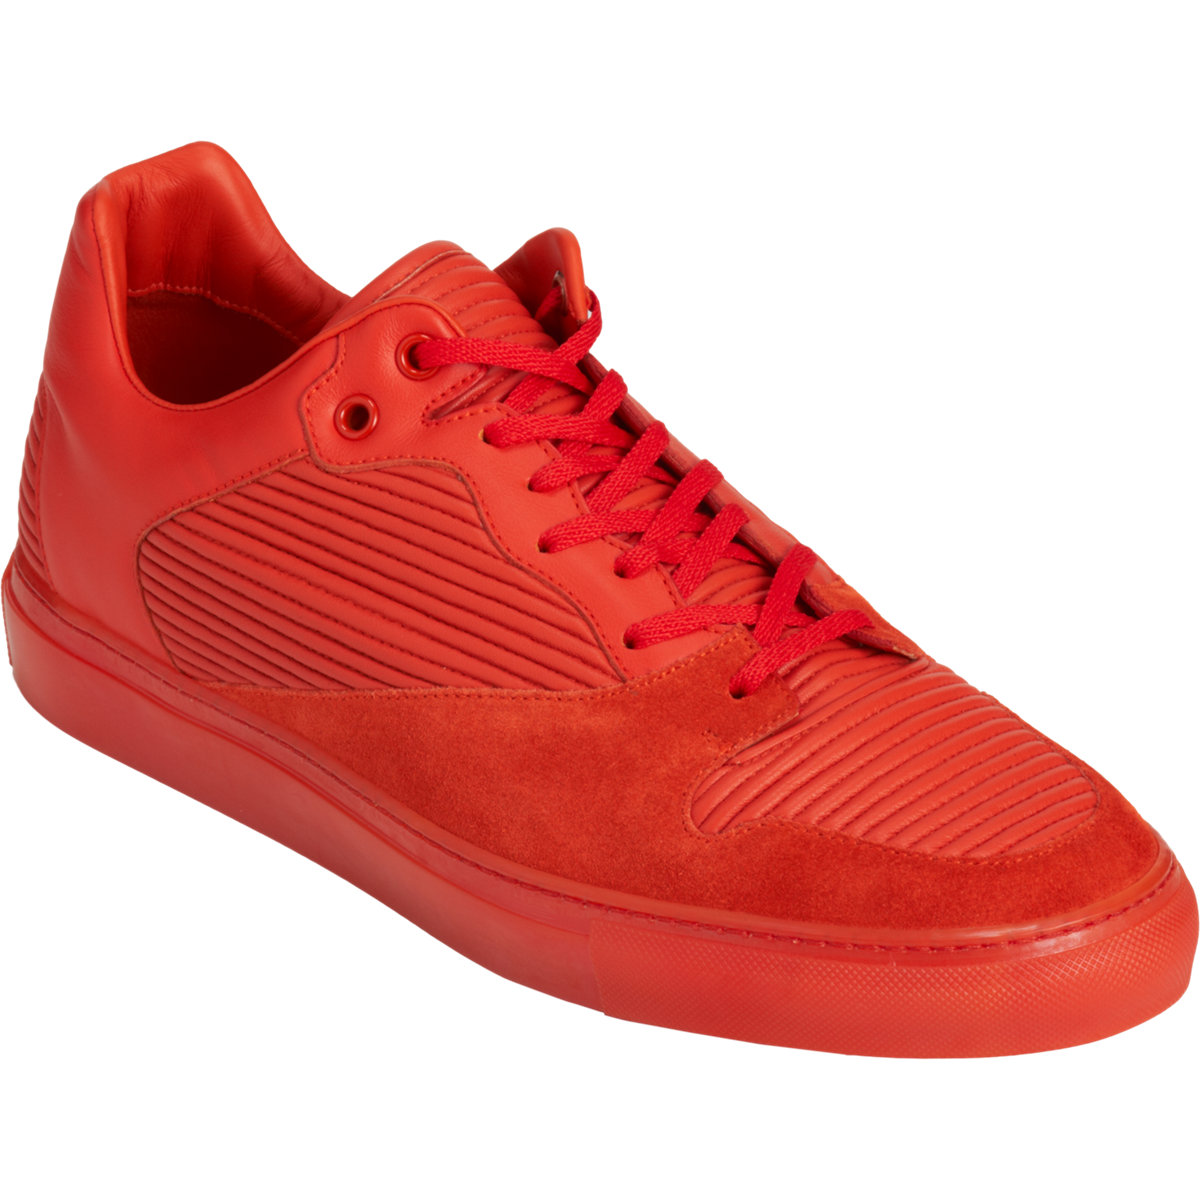 balenciaga low top sneaker in orange for men lyst. Black Bedroom Furniture Sets. Home Design Ideas